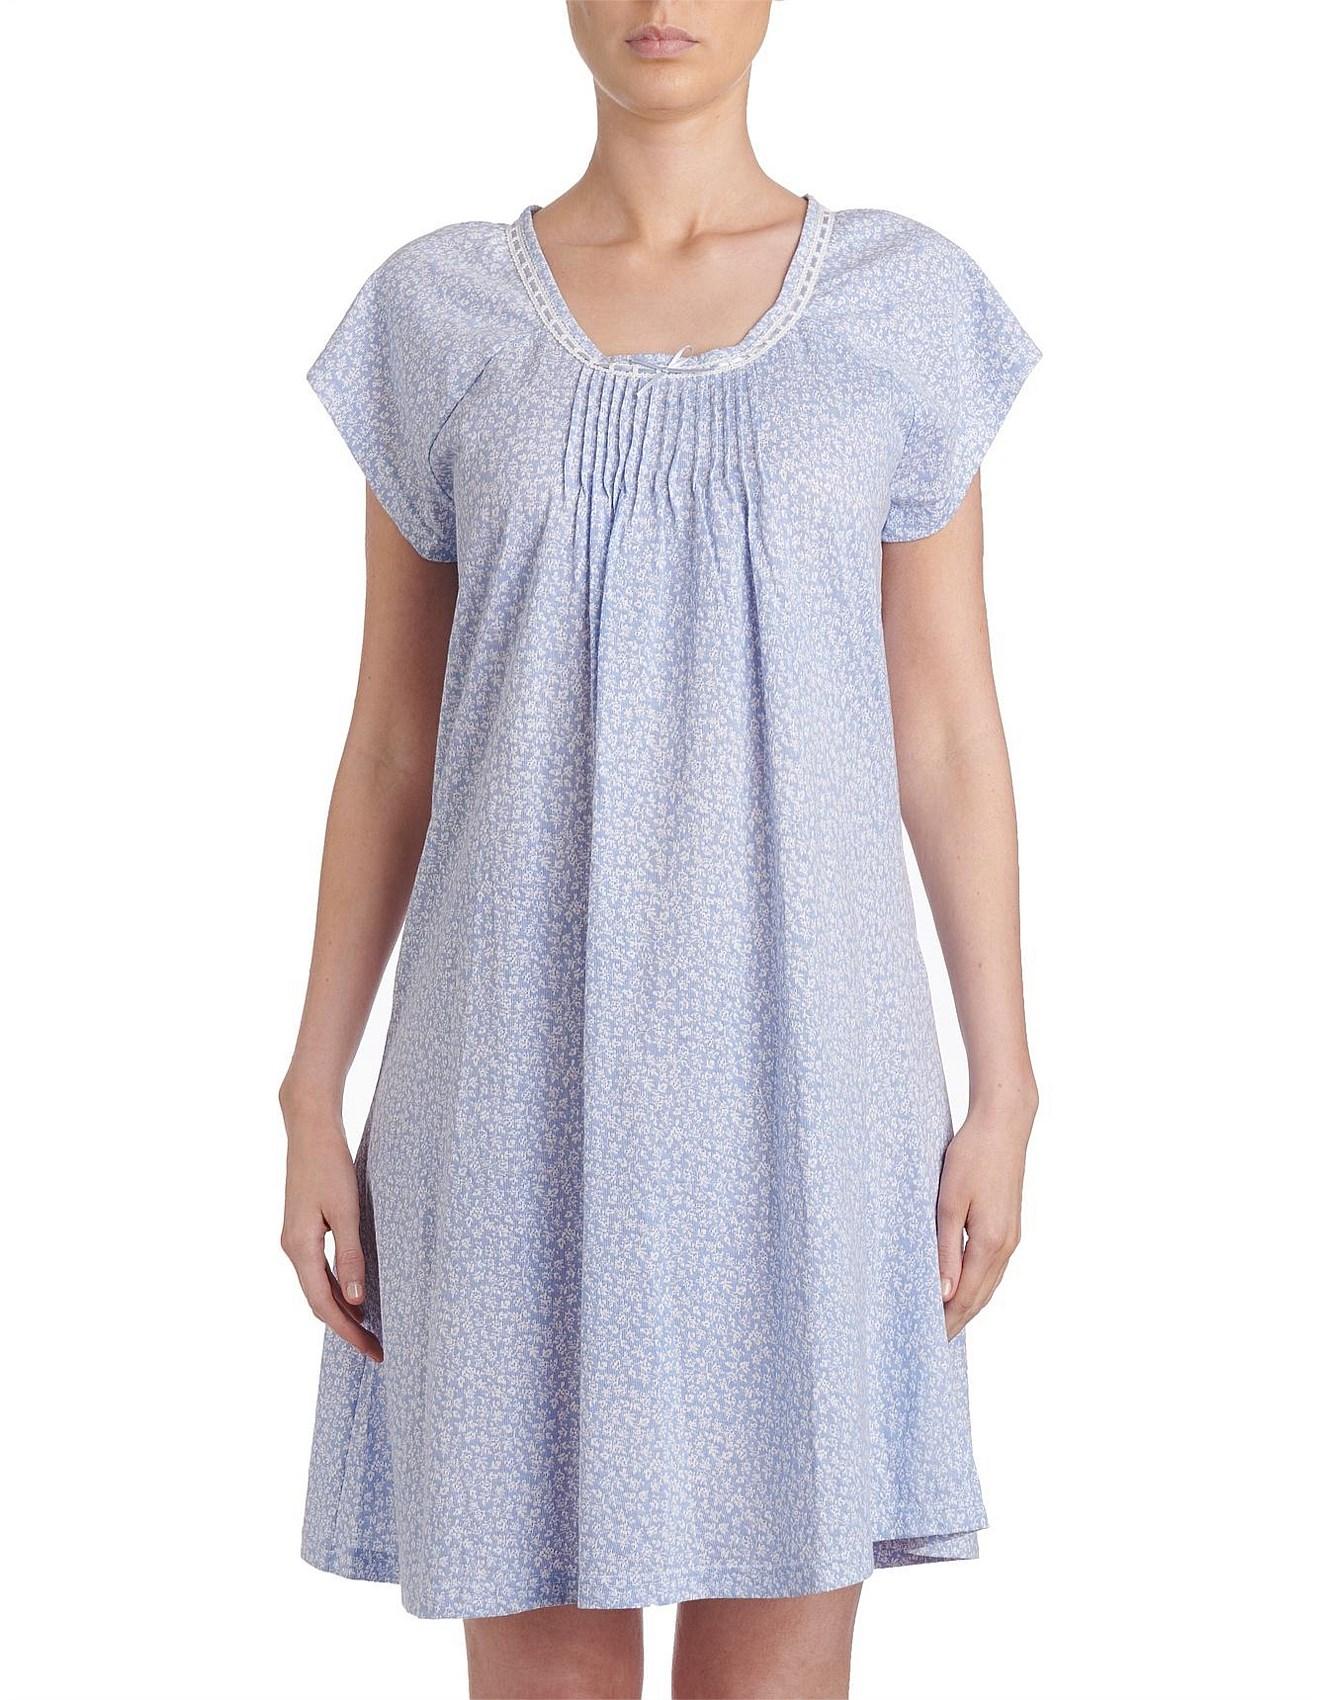 41b4543c5f Nightdresses & Nightshirts - Estelle Cap Sleeve Nightie